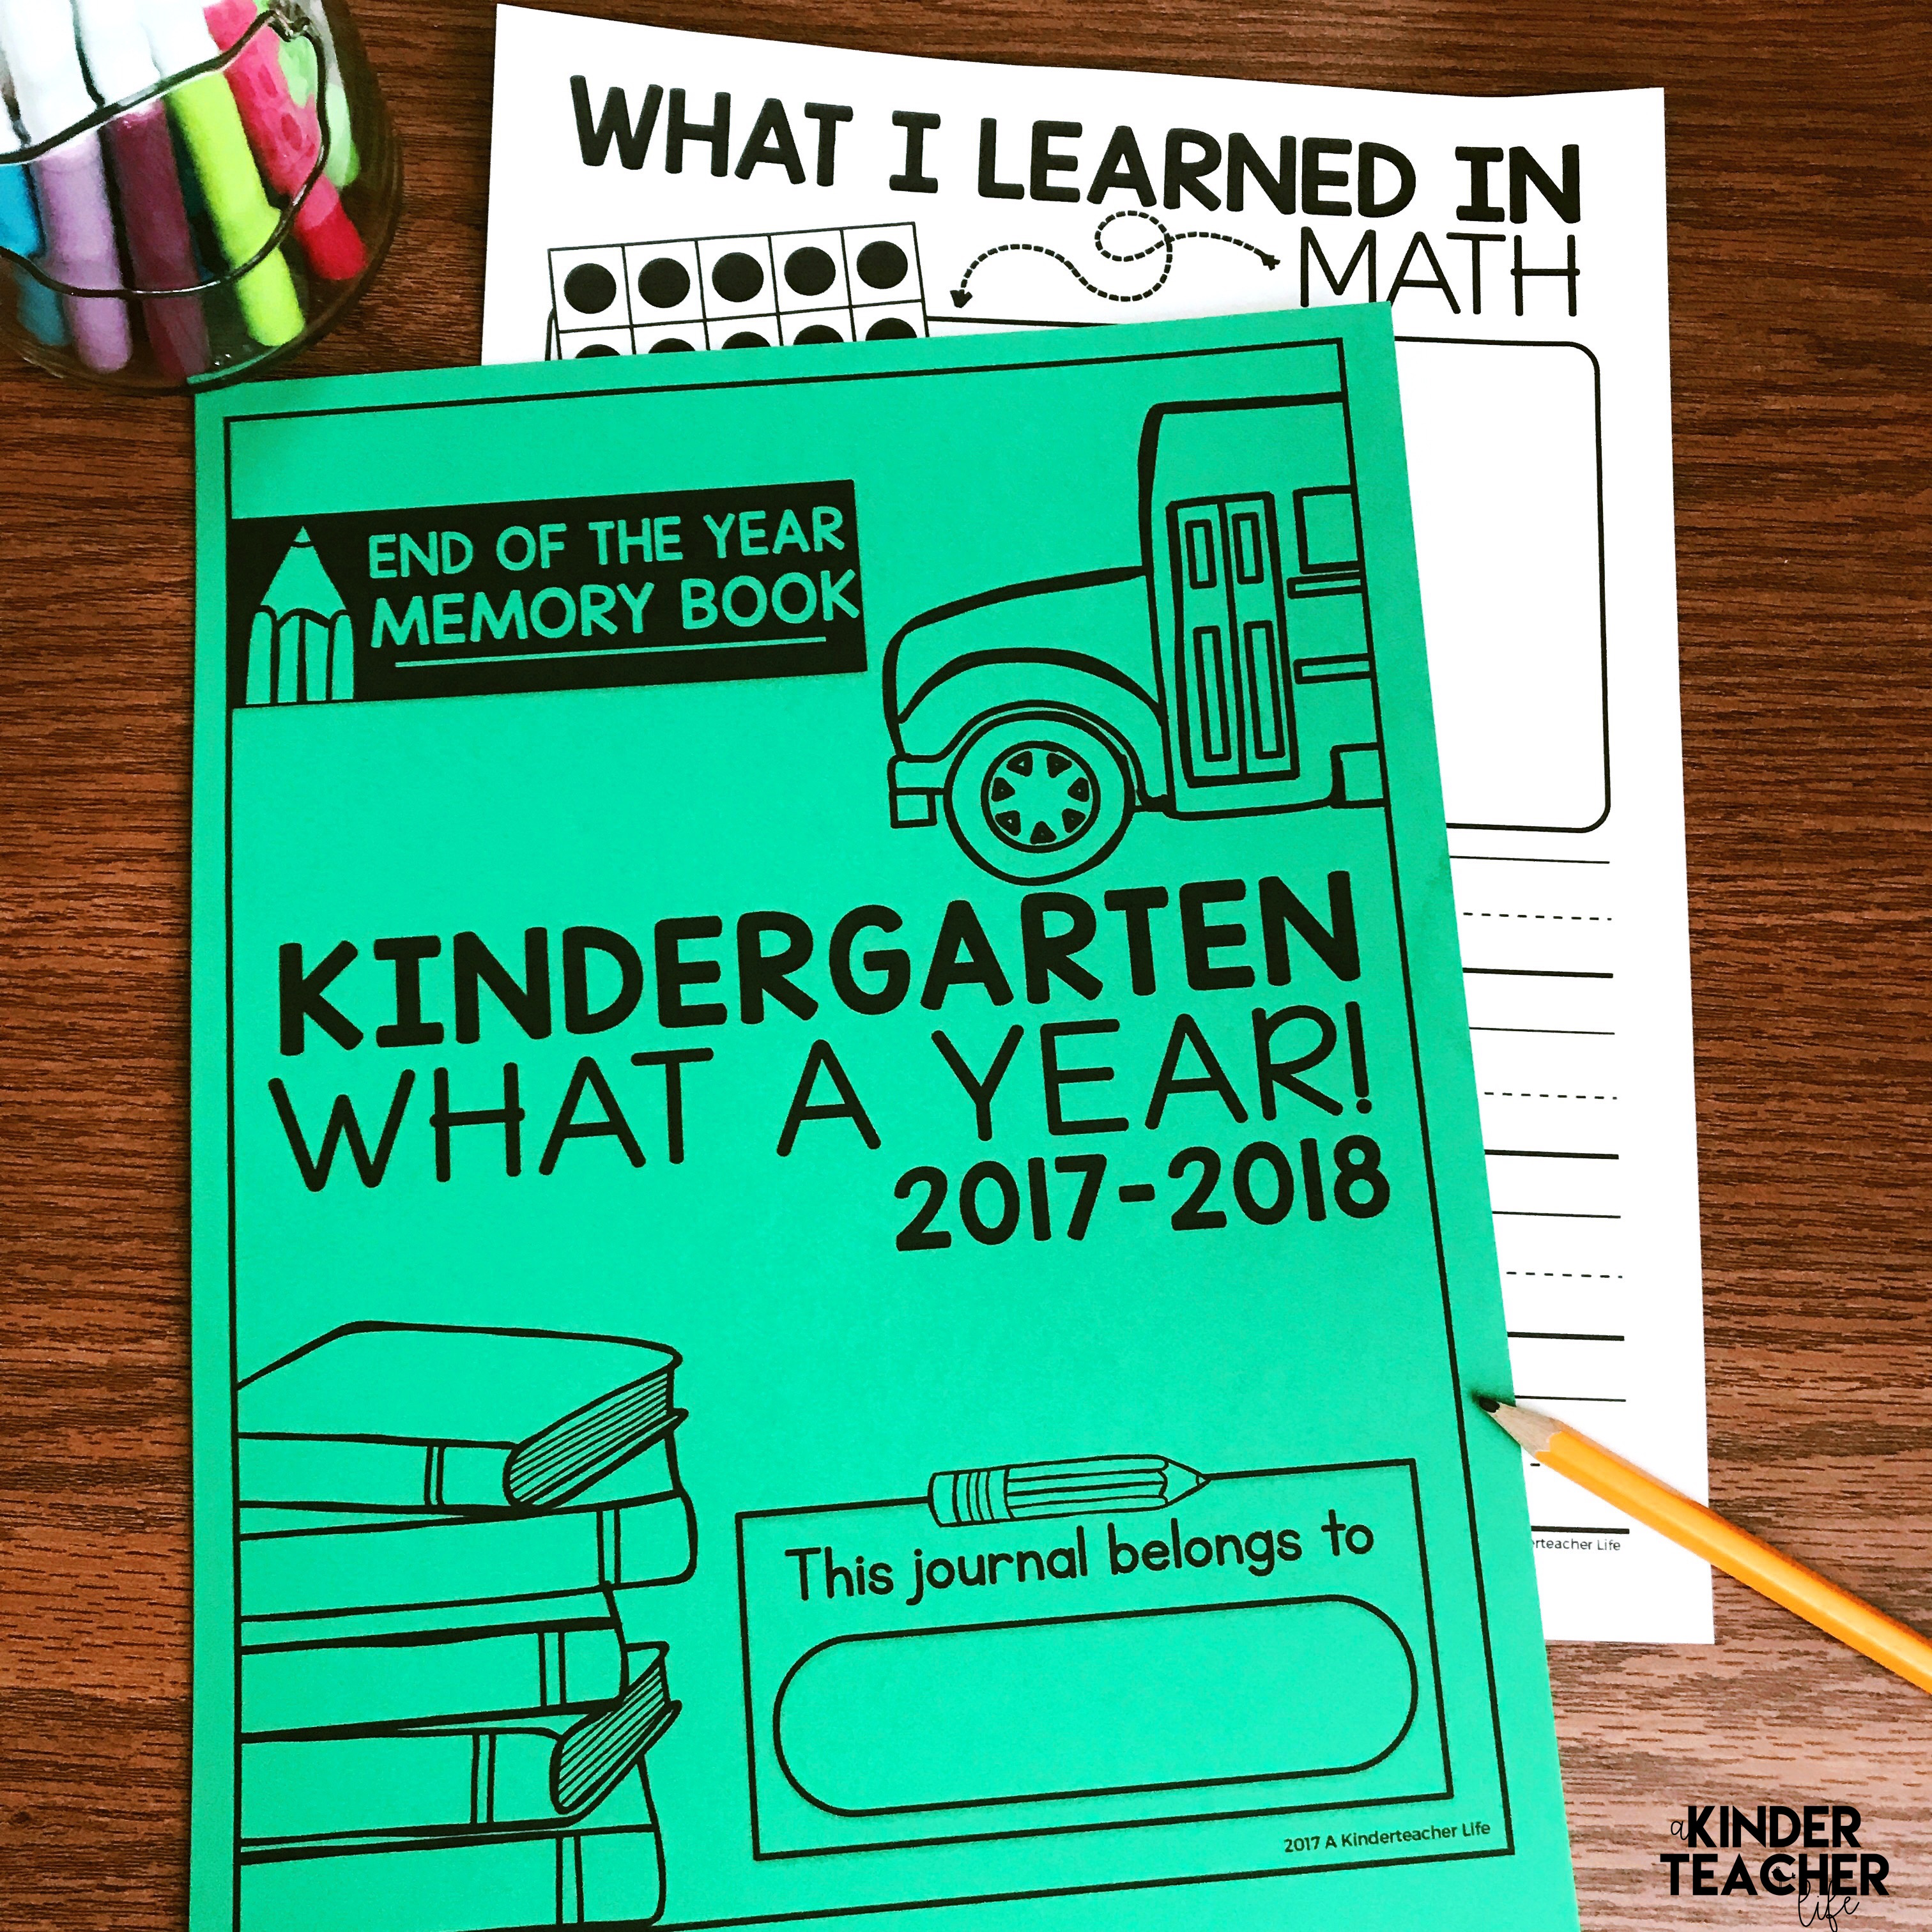 A Kinderteacher Life - A Primary Teaching Blog